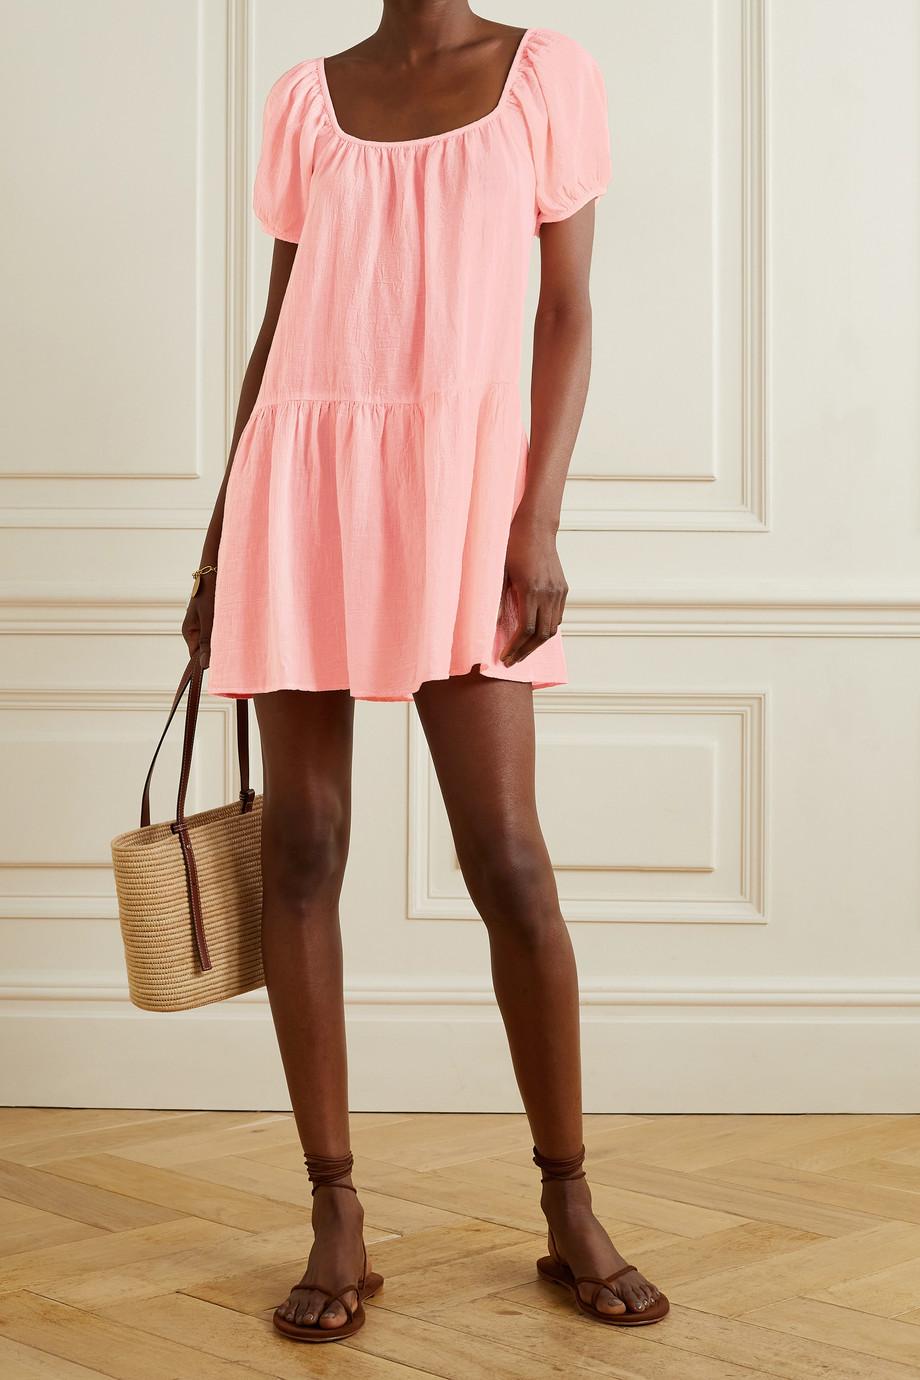 Honorine Elodie Minikleid aus Baumwollgaze